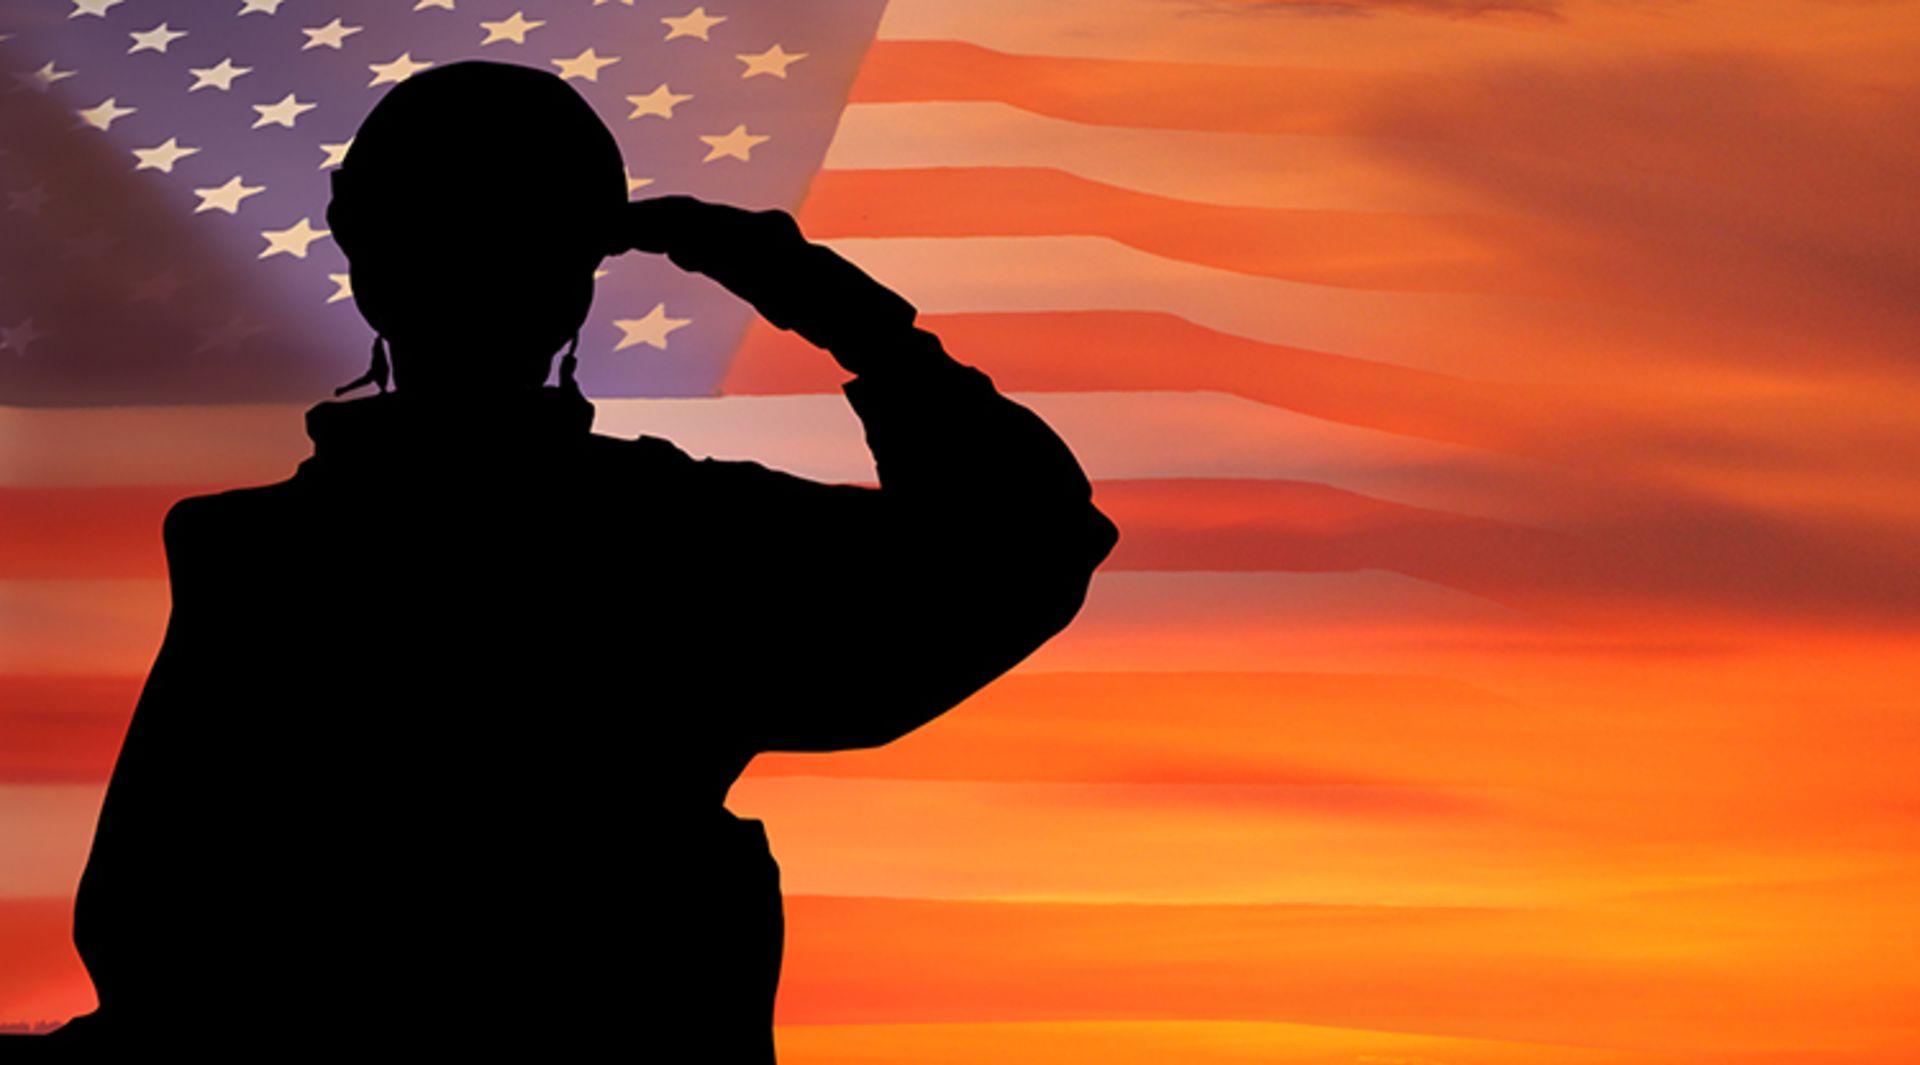 5 Ways We Can Appreciate Our Veterans